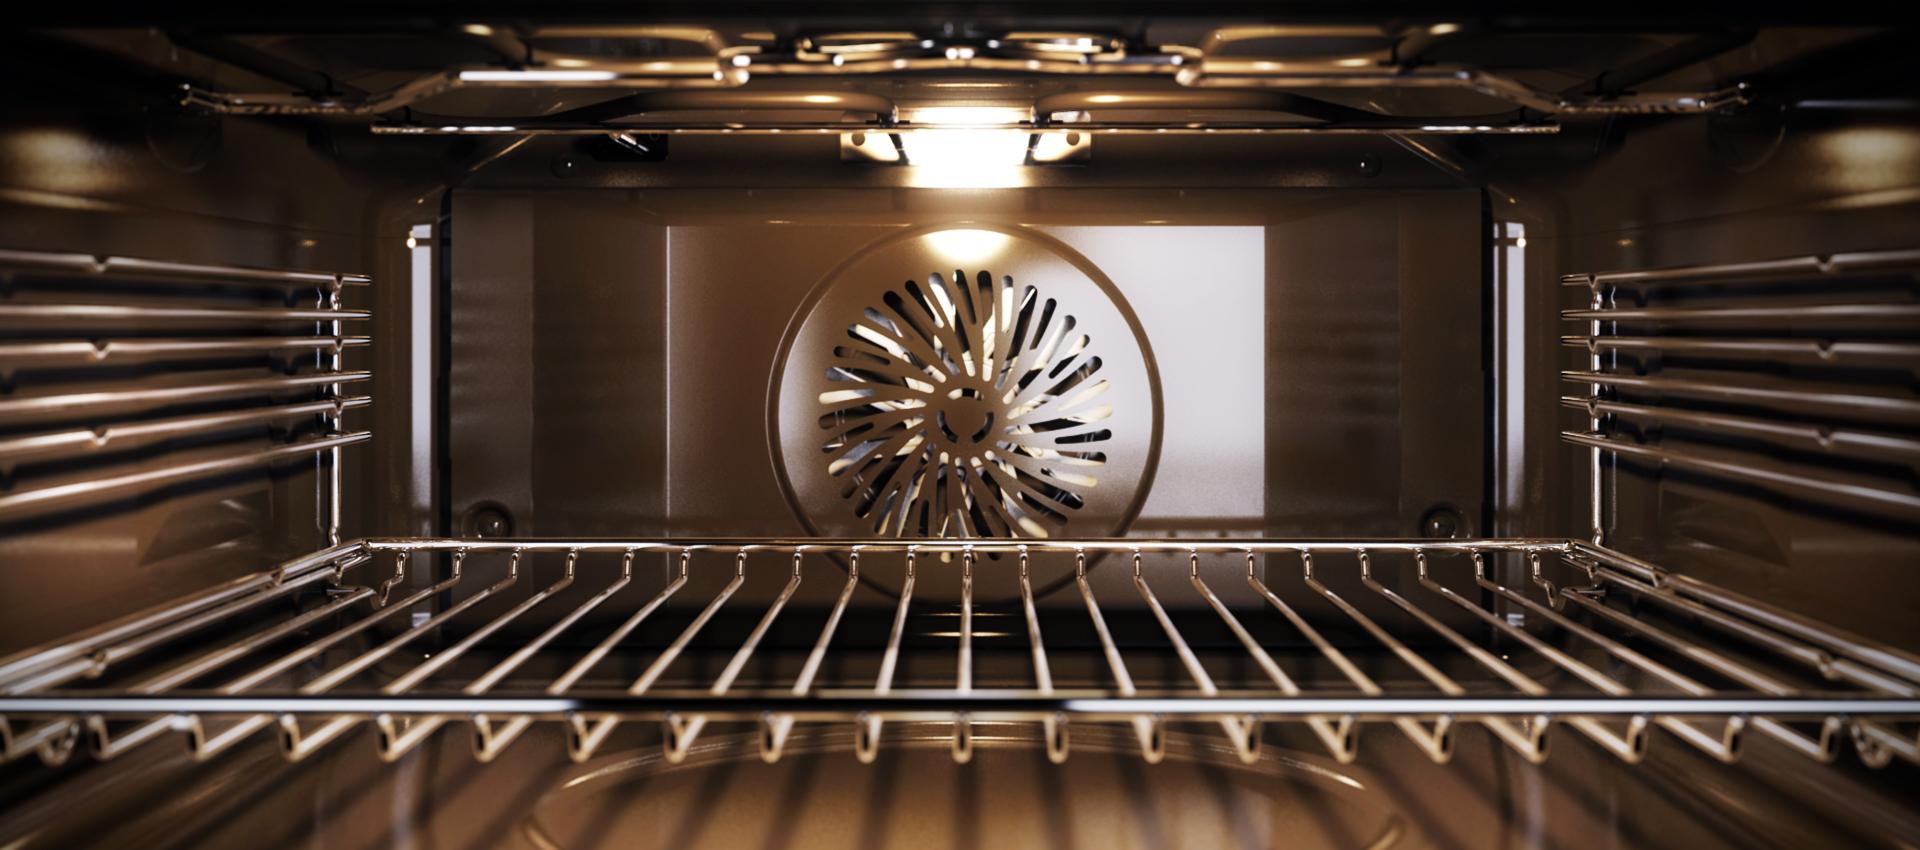 AEG_Kitchen_Asset_Production_3